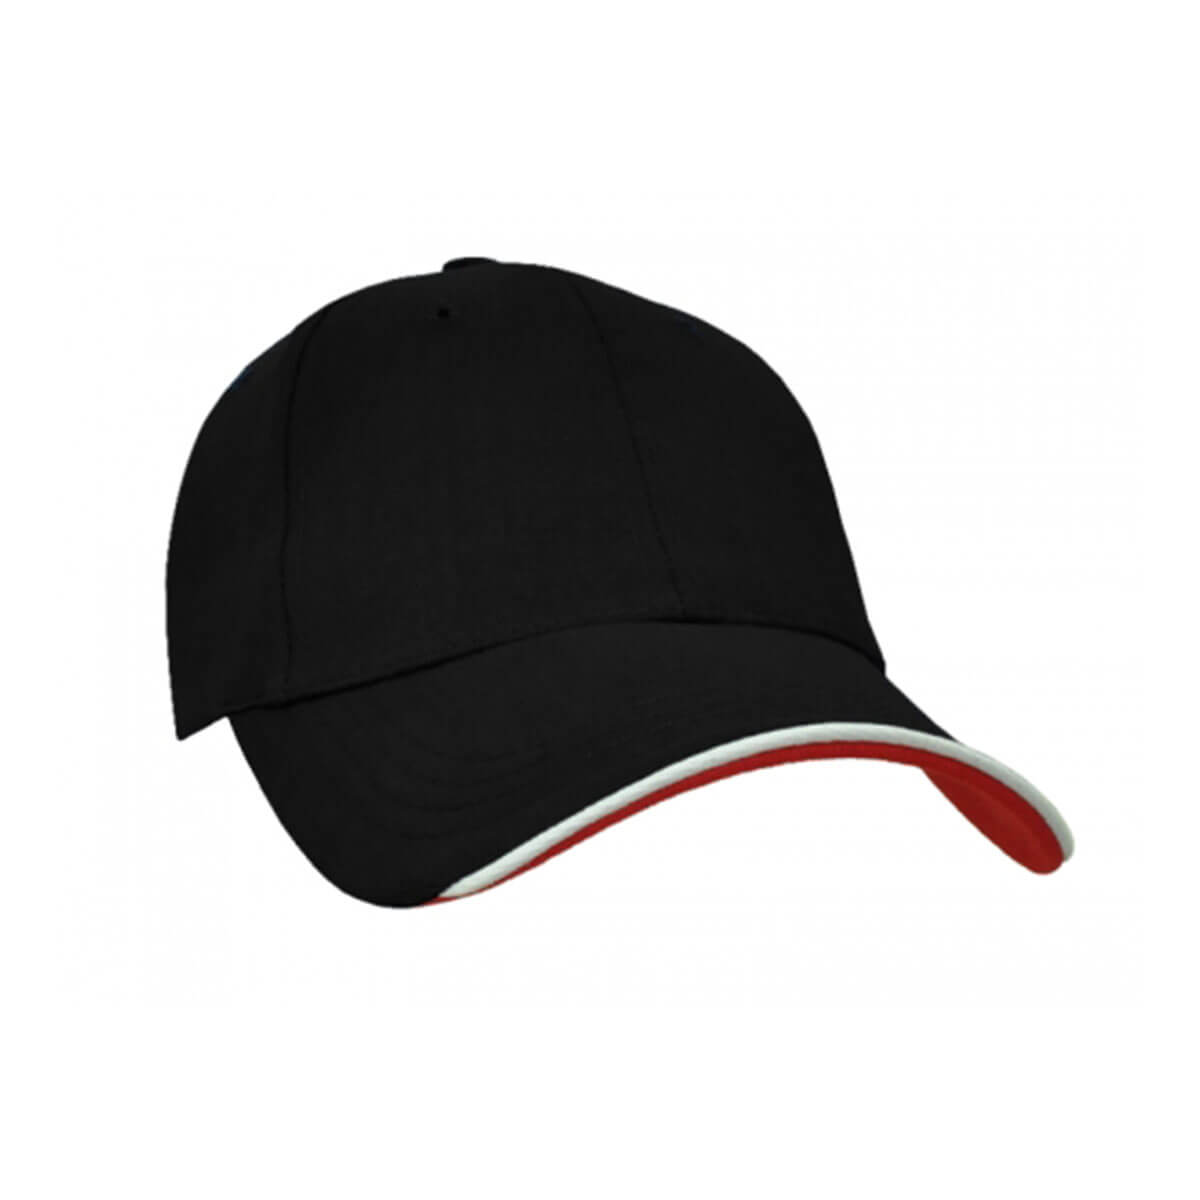 Navigator Cap-Black / White / Red